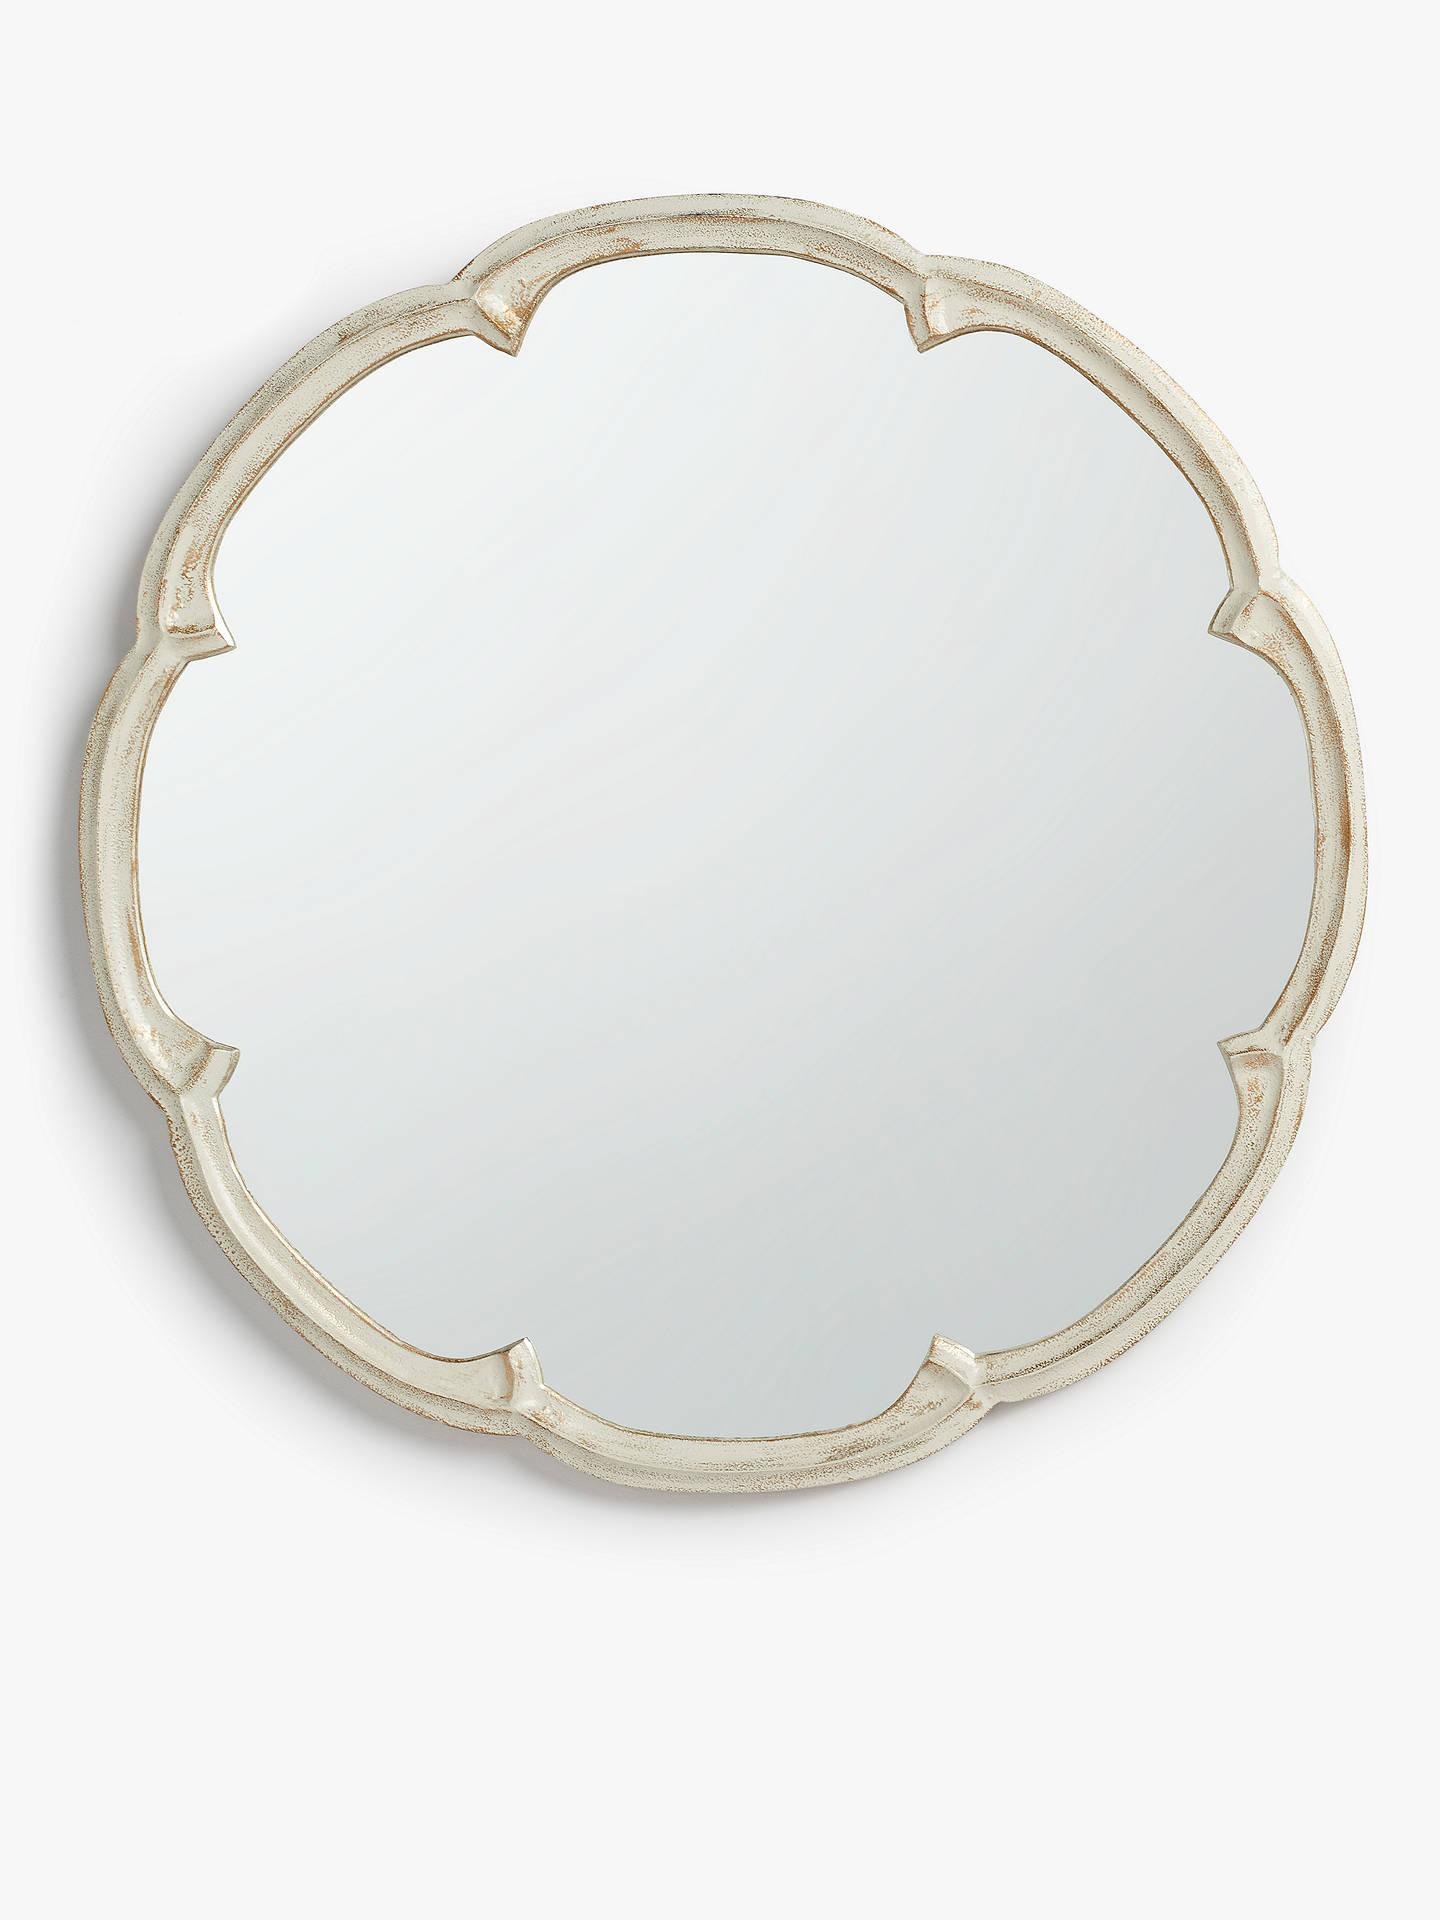 John Lewis & Partners Annabel Cast Decorative Mirror, Dia.60cm, Cream by John Lewis & Partners